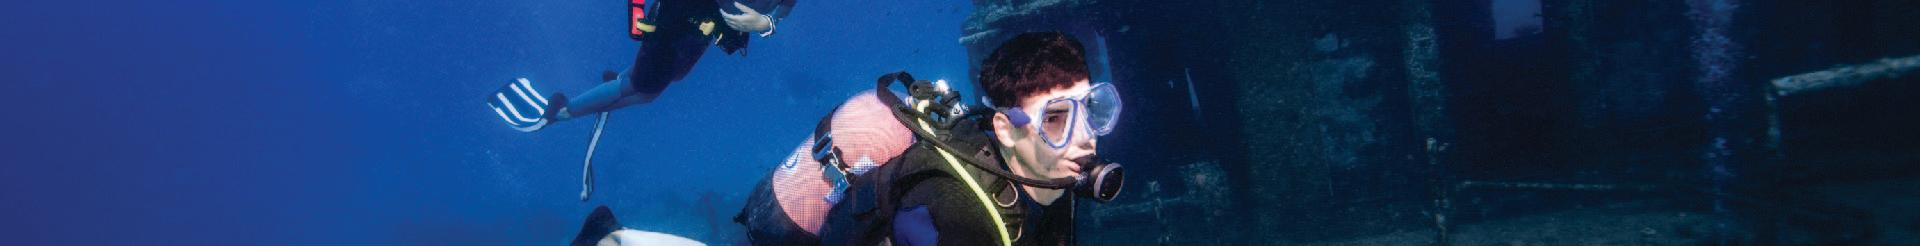 Buoyancy Compensator Device